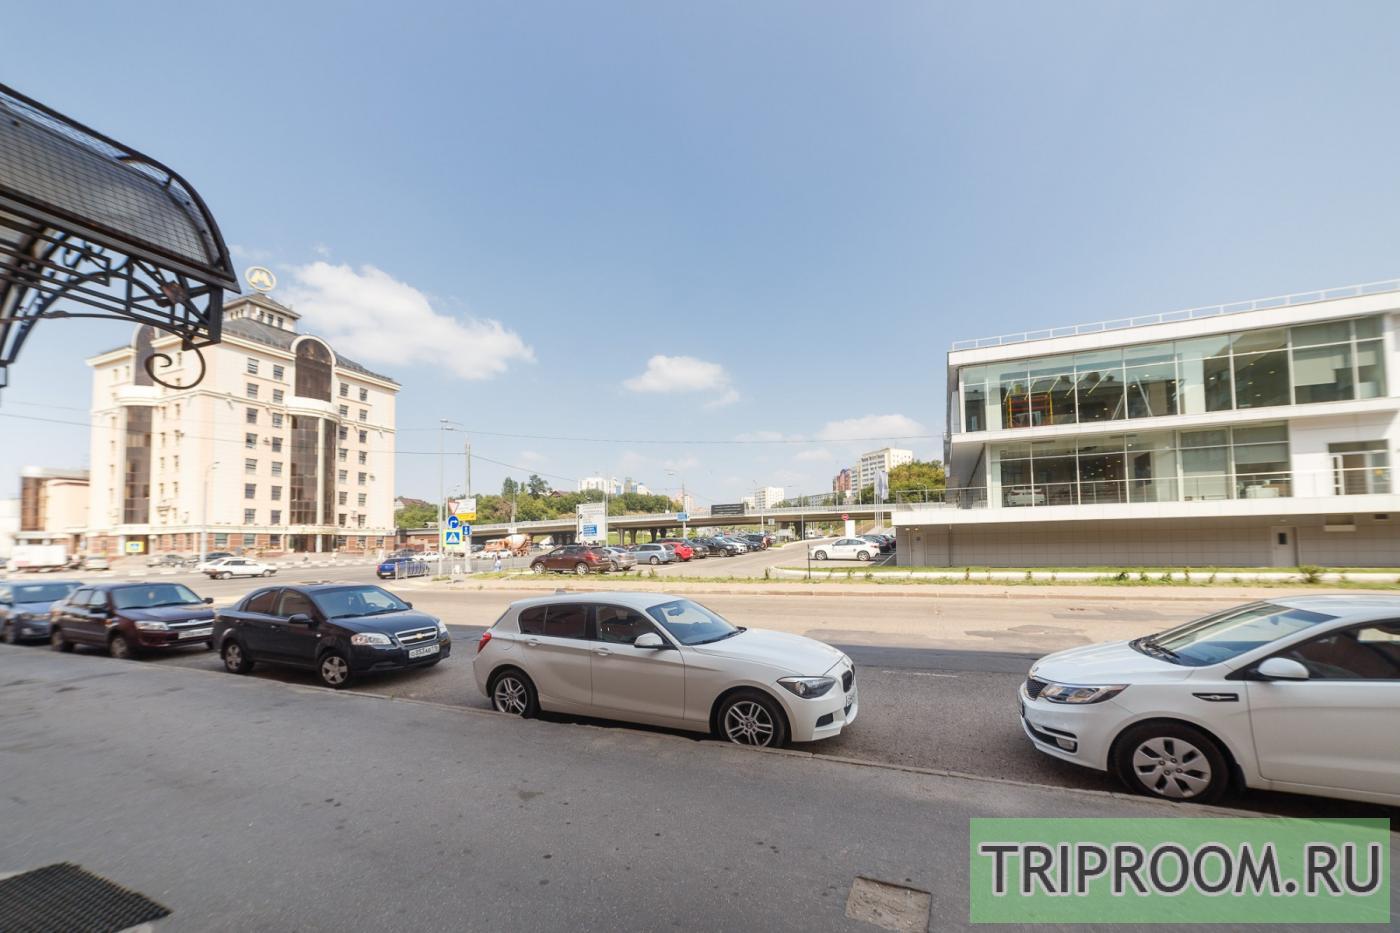 3-комнатная квартира посуточно (вариант № 15948), ул. Назарбаева улица, фото № 24